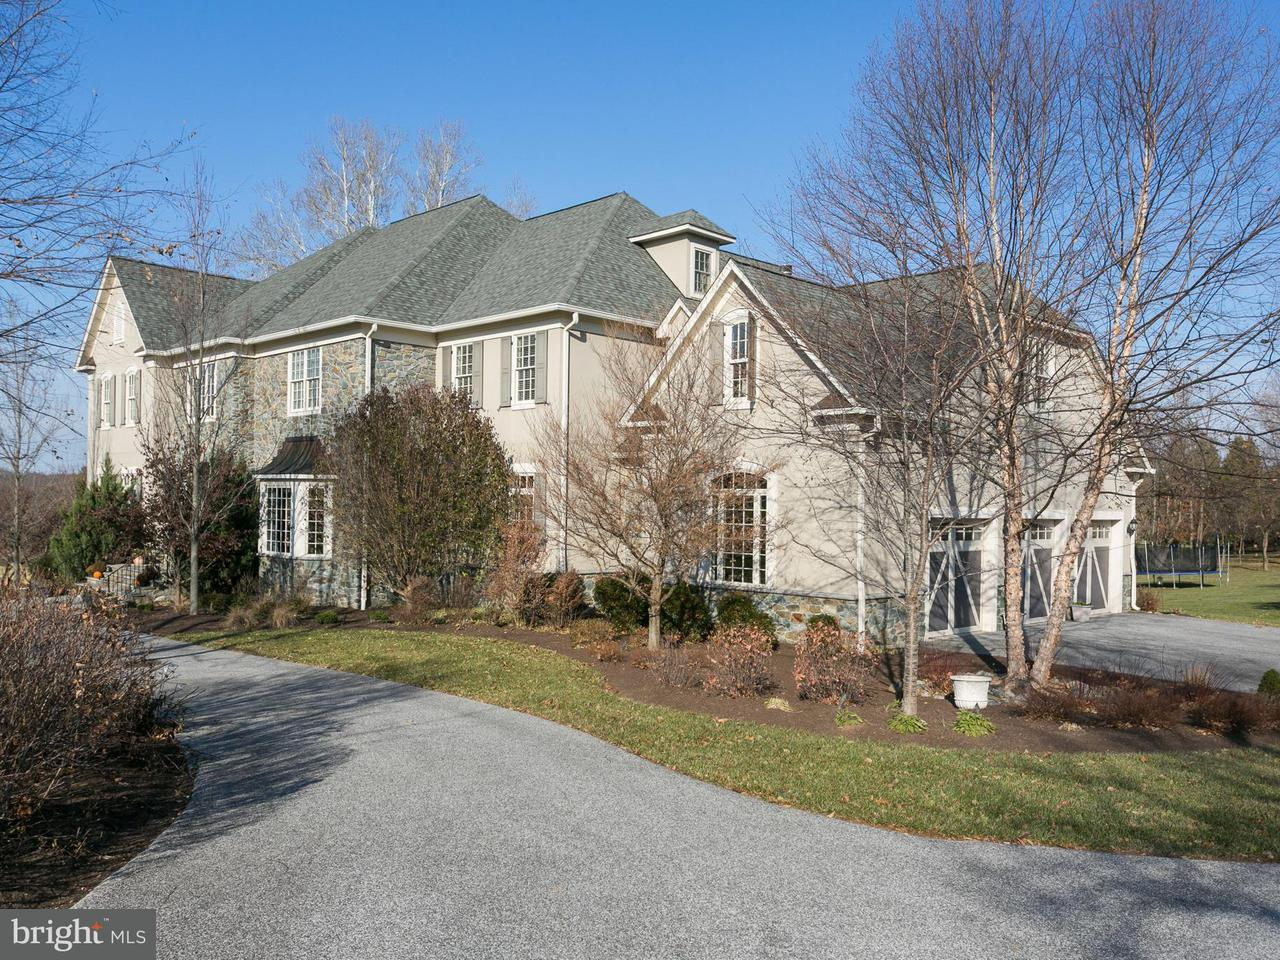 Single Family Home for Sale at 15310 LEONDINA Drive 15310 LEONDINA Drive Glenwood, Maryland 21738 United States